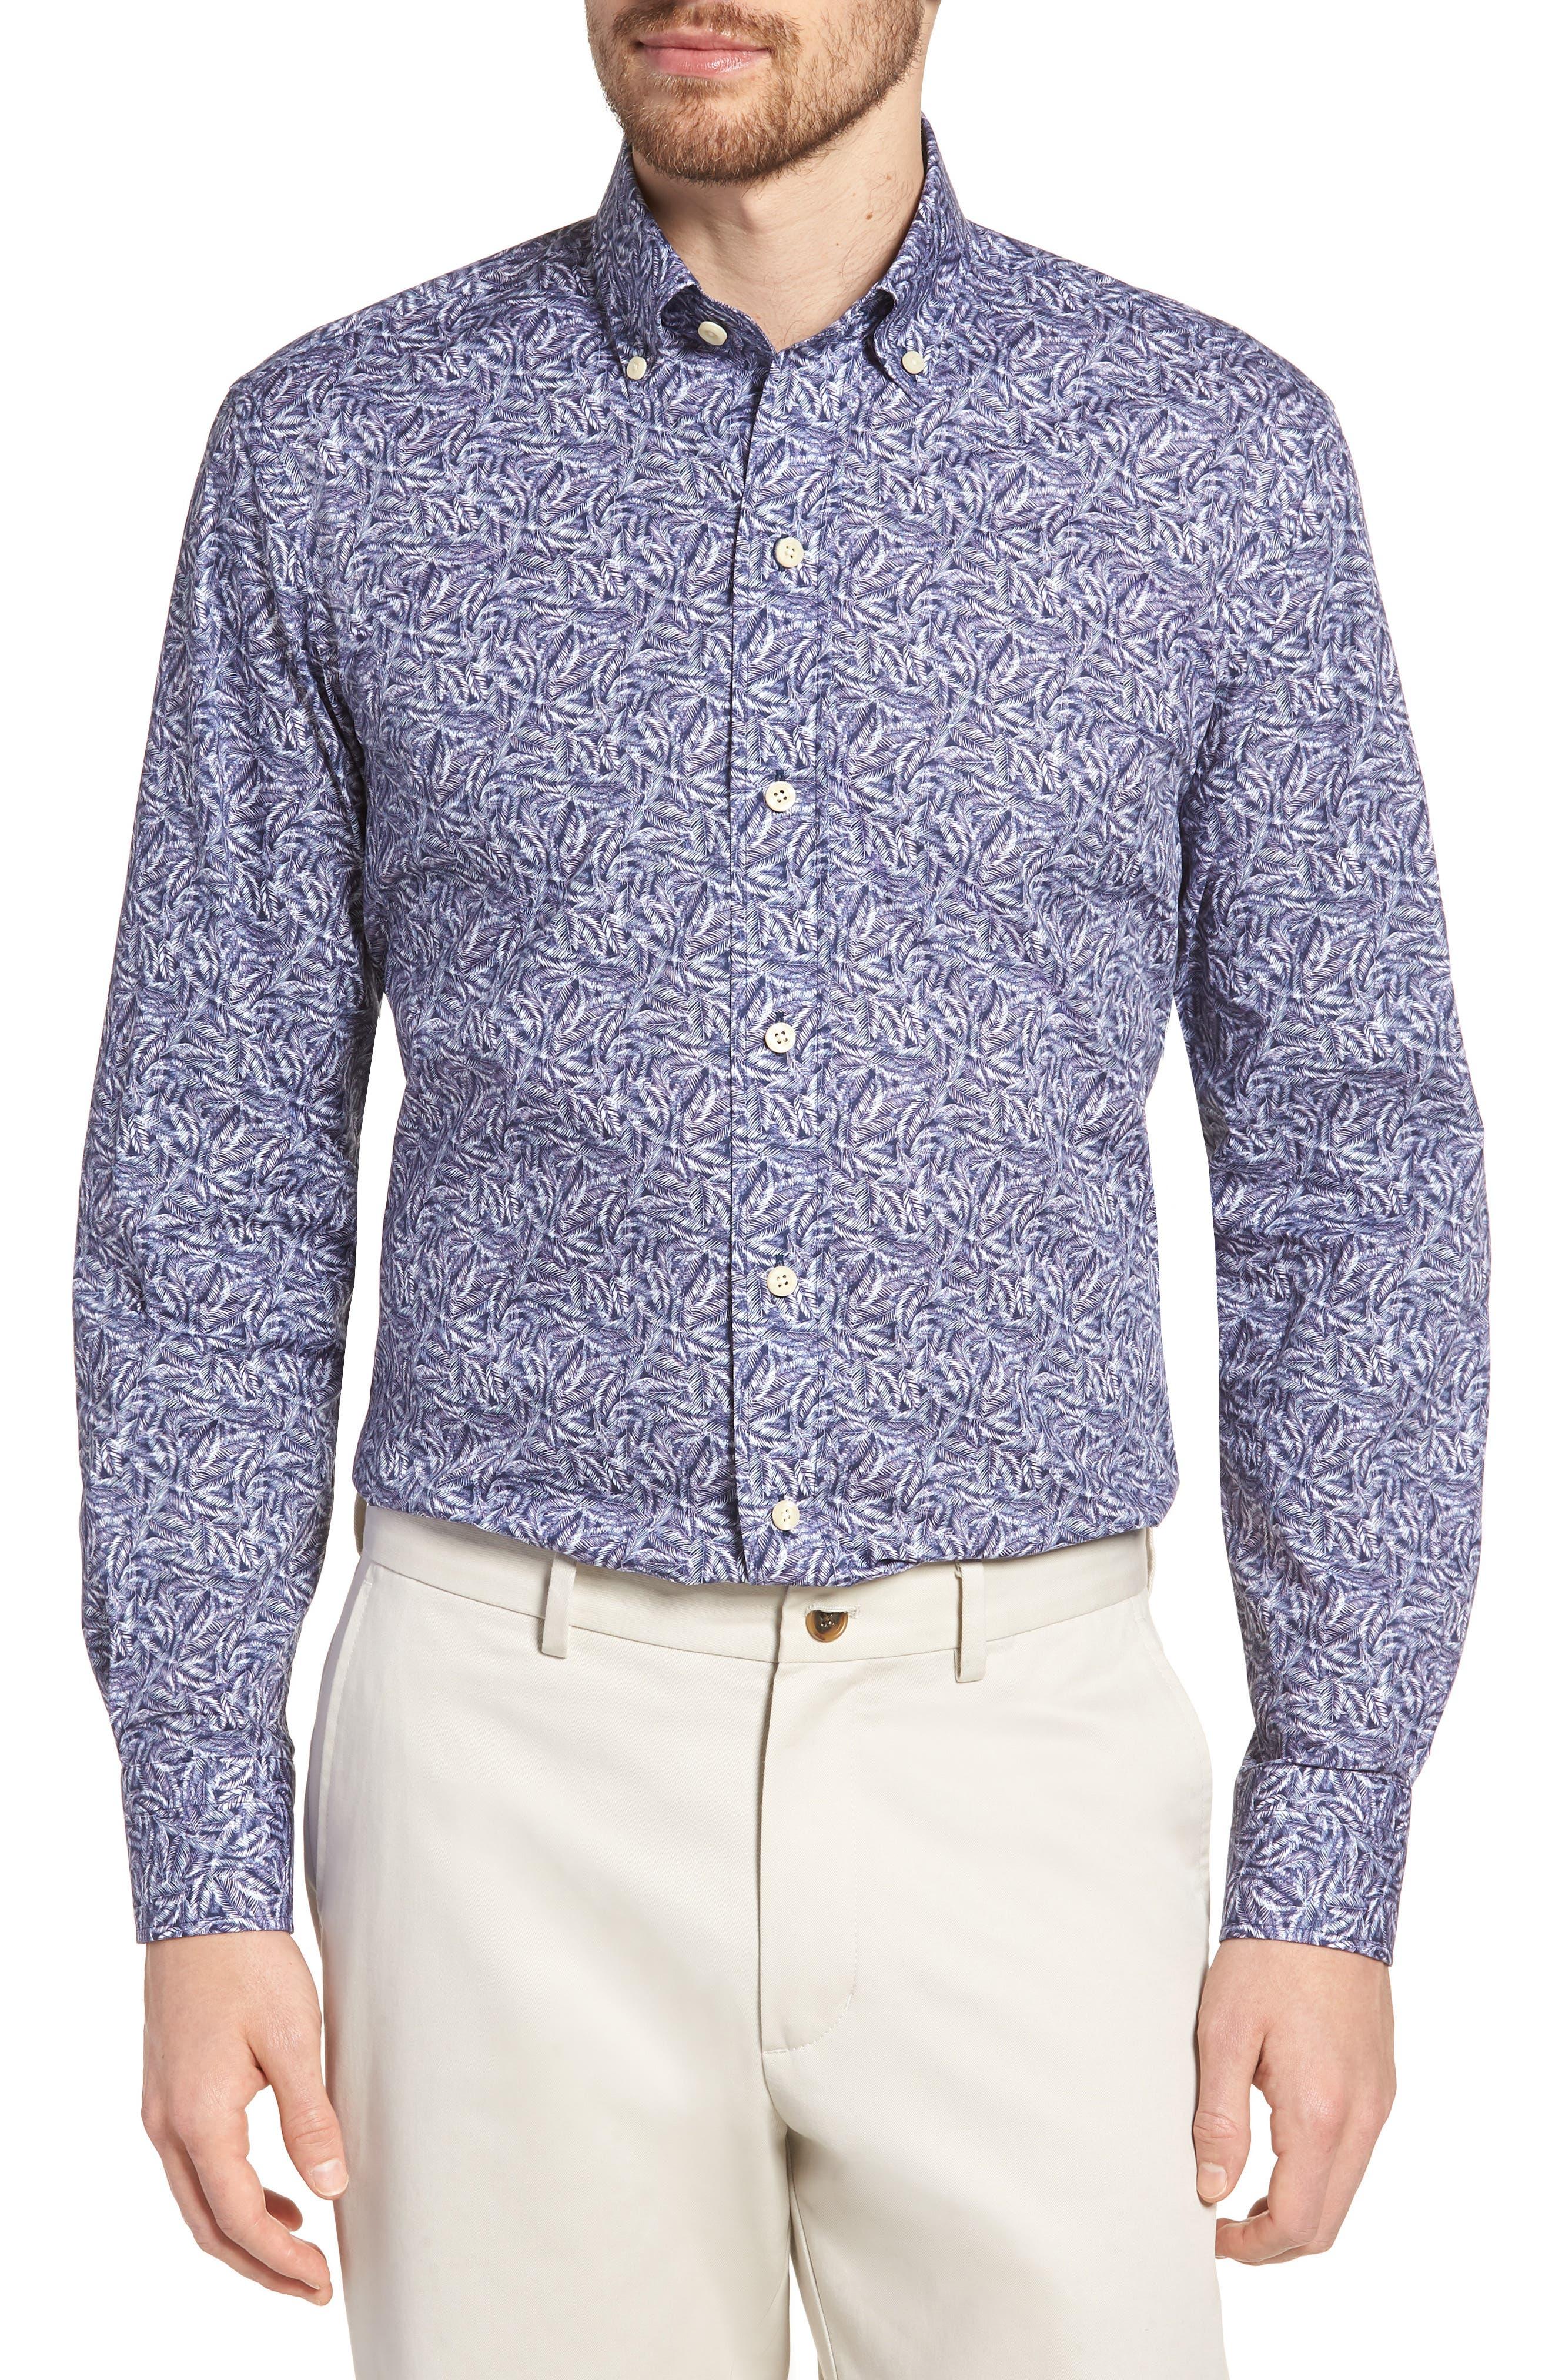 Garnaby Slim Fit Print Dress Shirt,                         Main,                         color, Blue